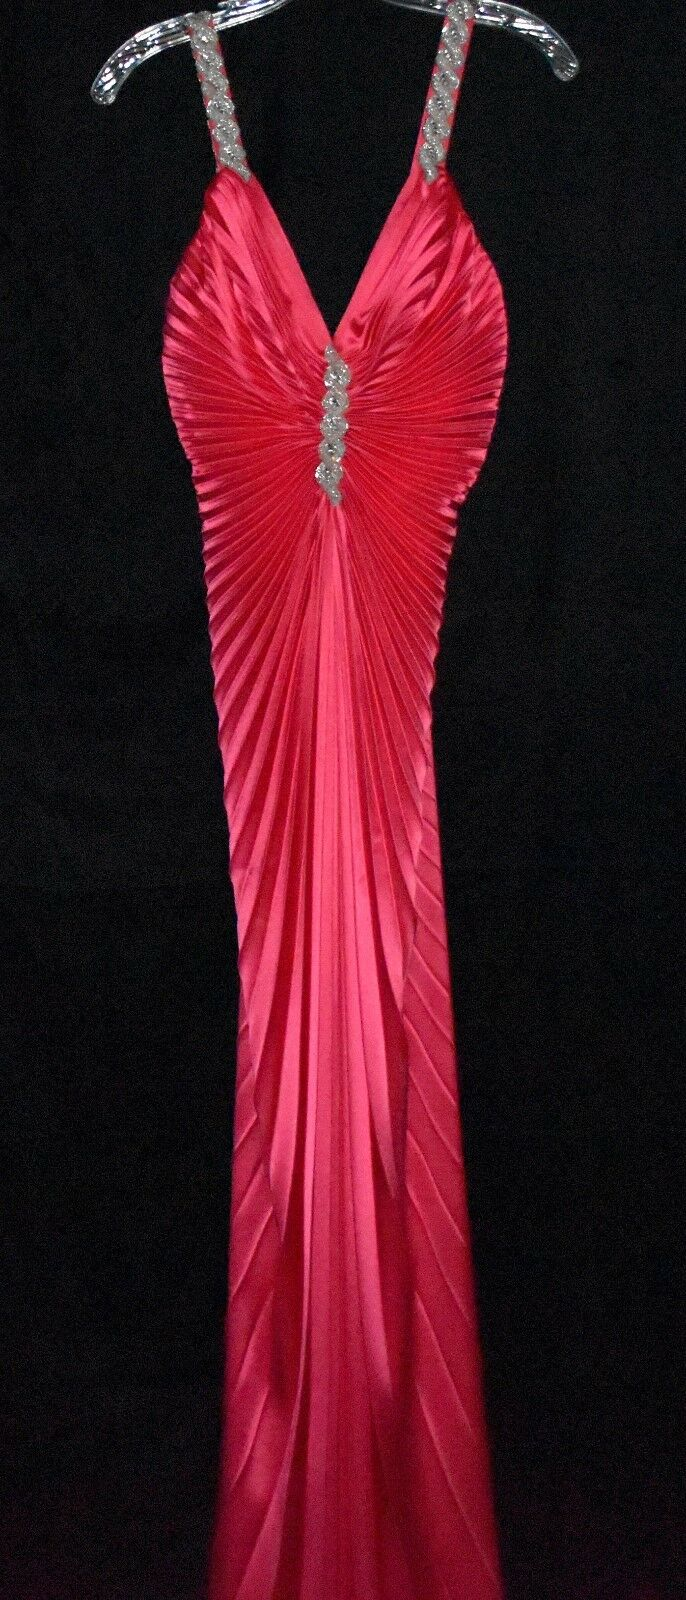 Nicole Bakti Pink Accordion Pleated Maxi Dress with Beads & Rhinestones Size S